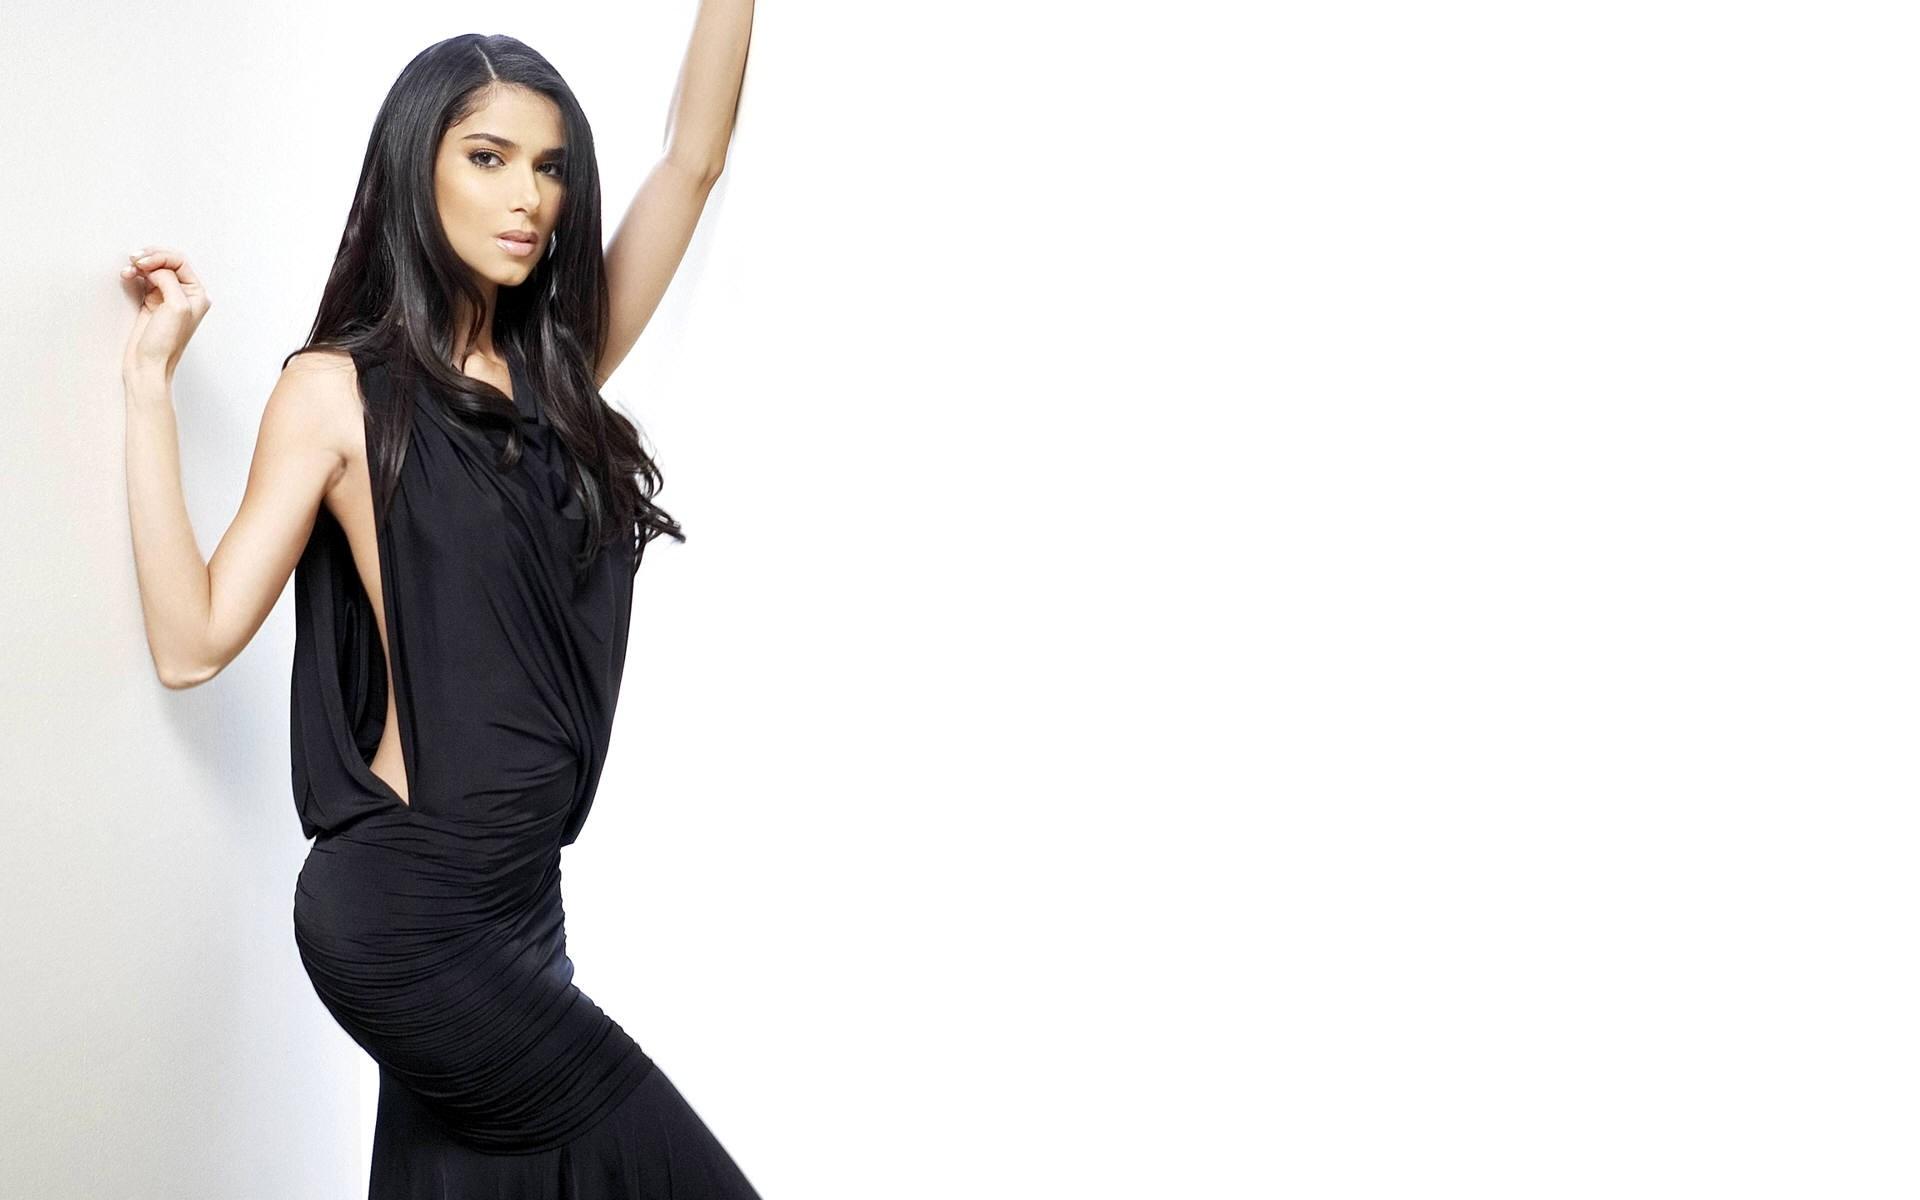 roselyn sanchez black dress wallpaper 54714